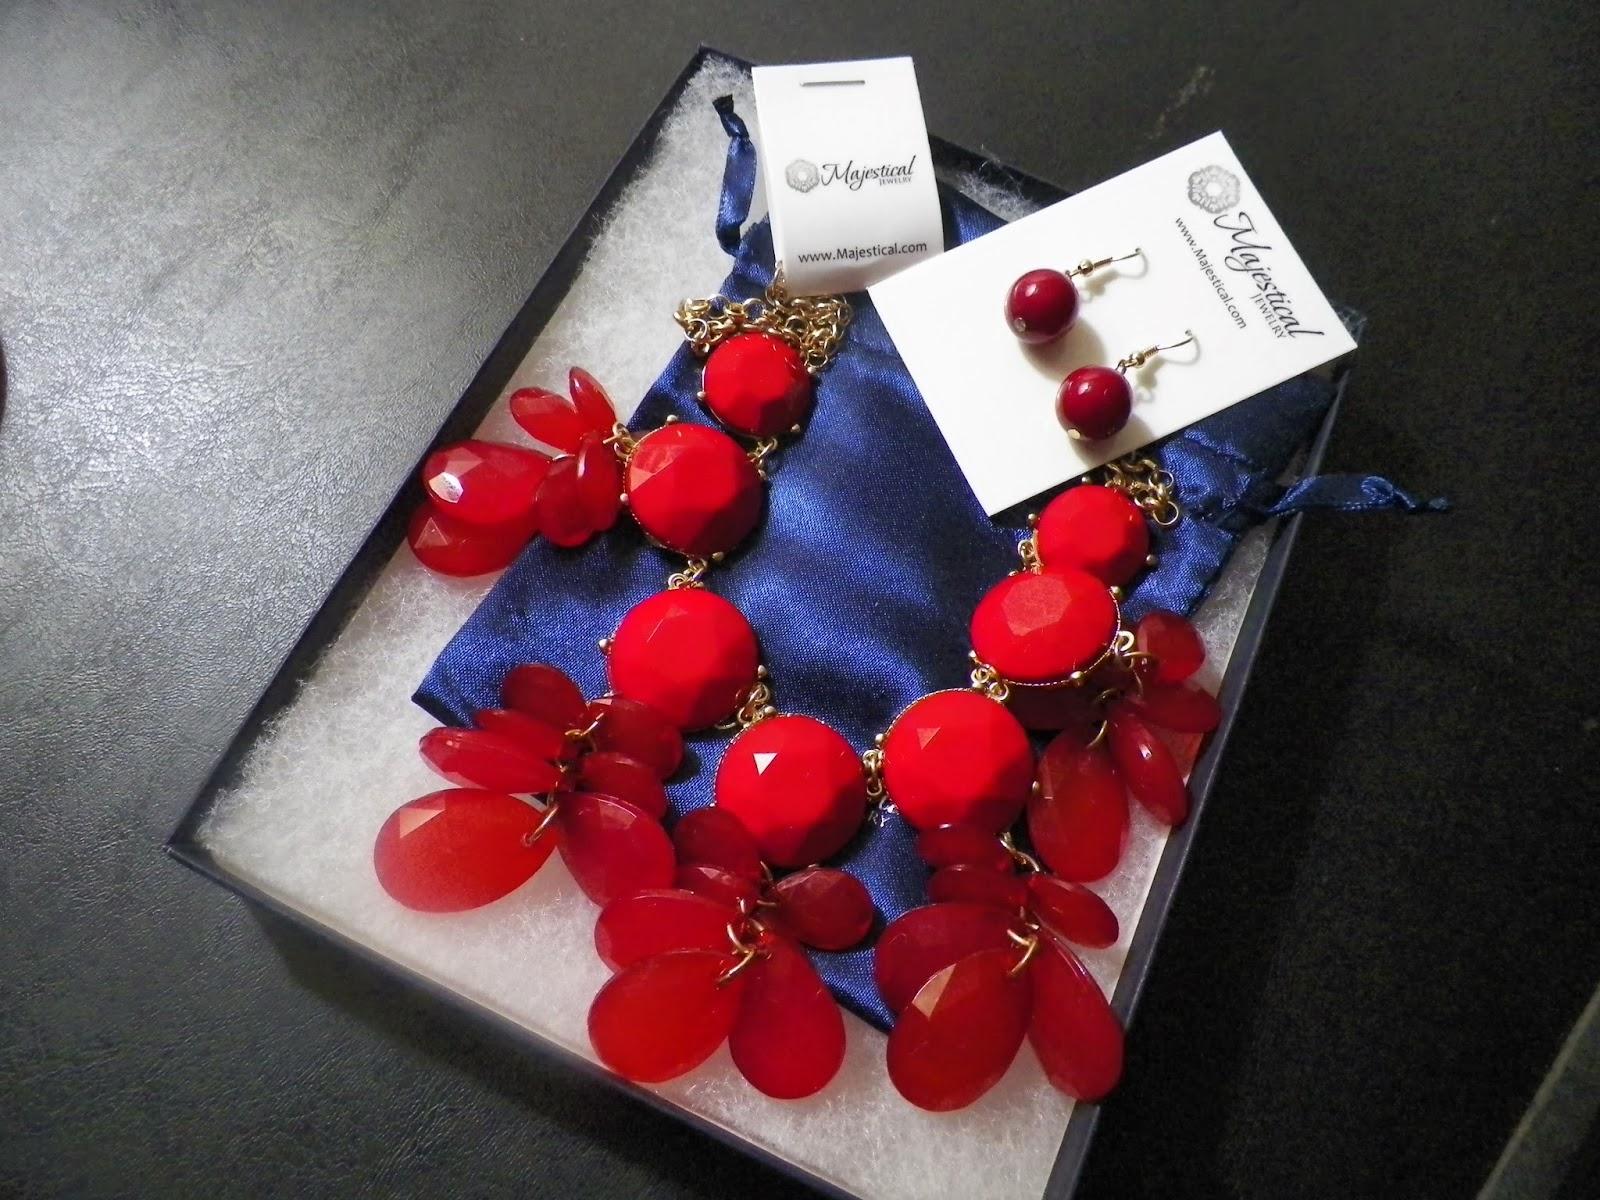 Fashionjewelry.jpg